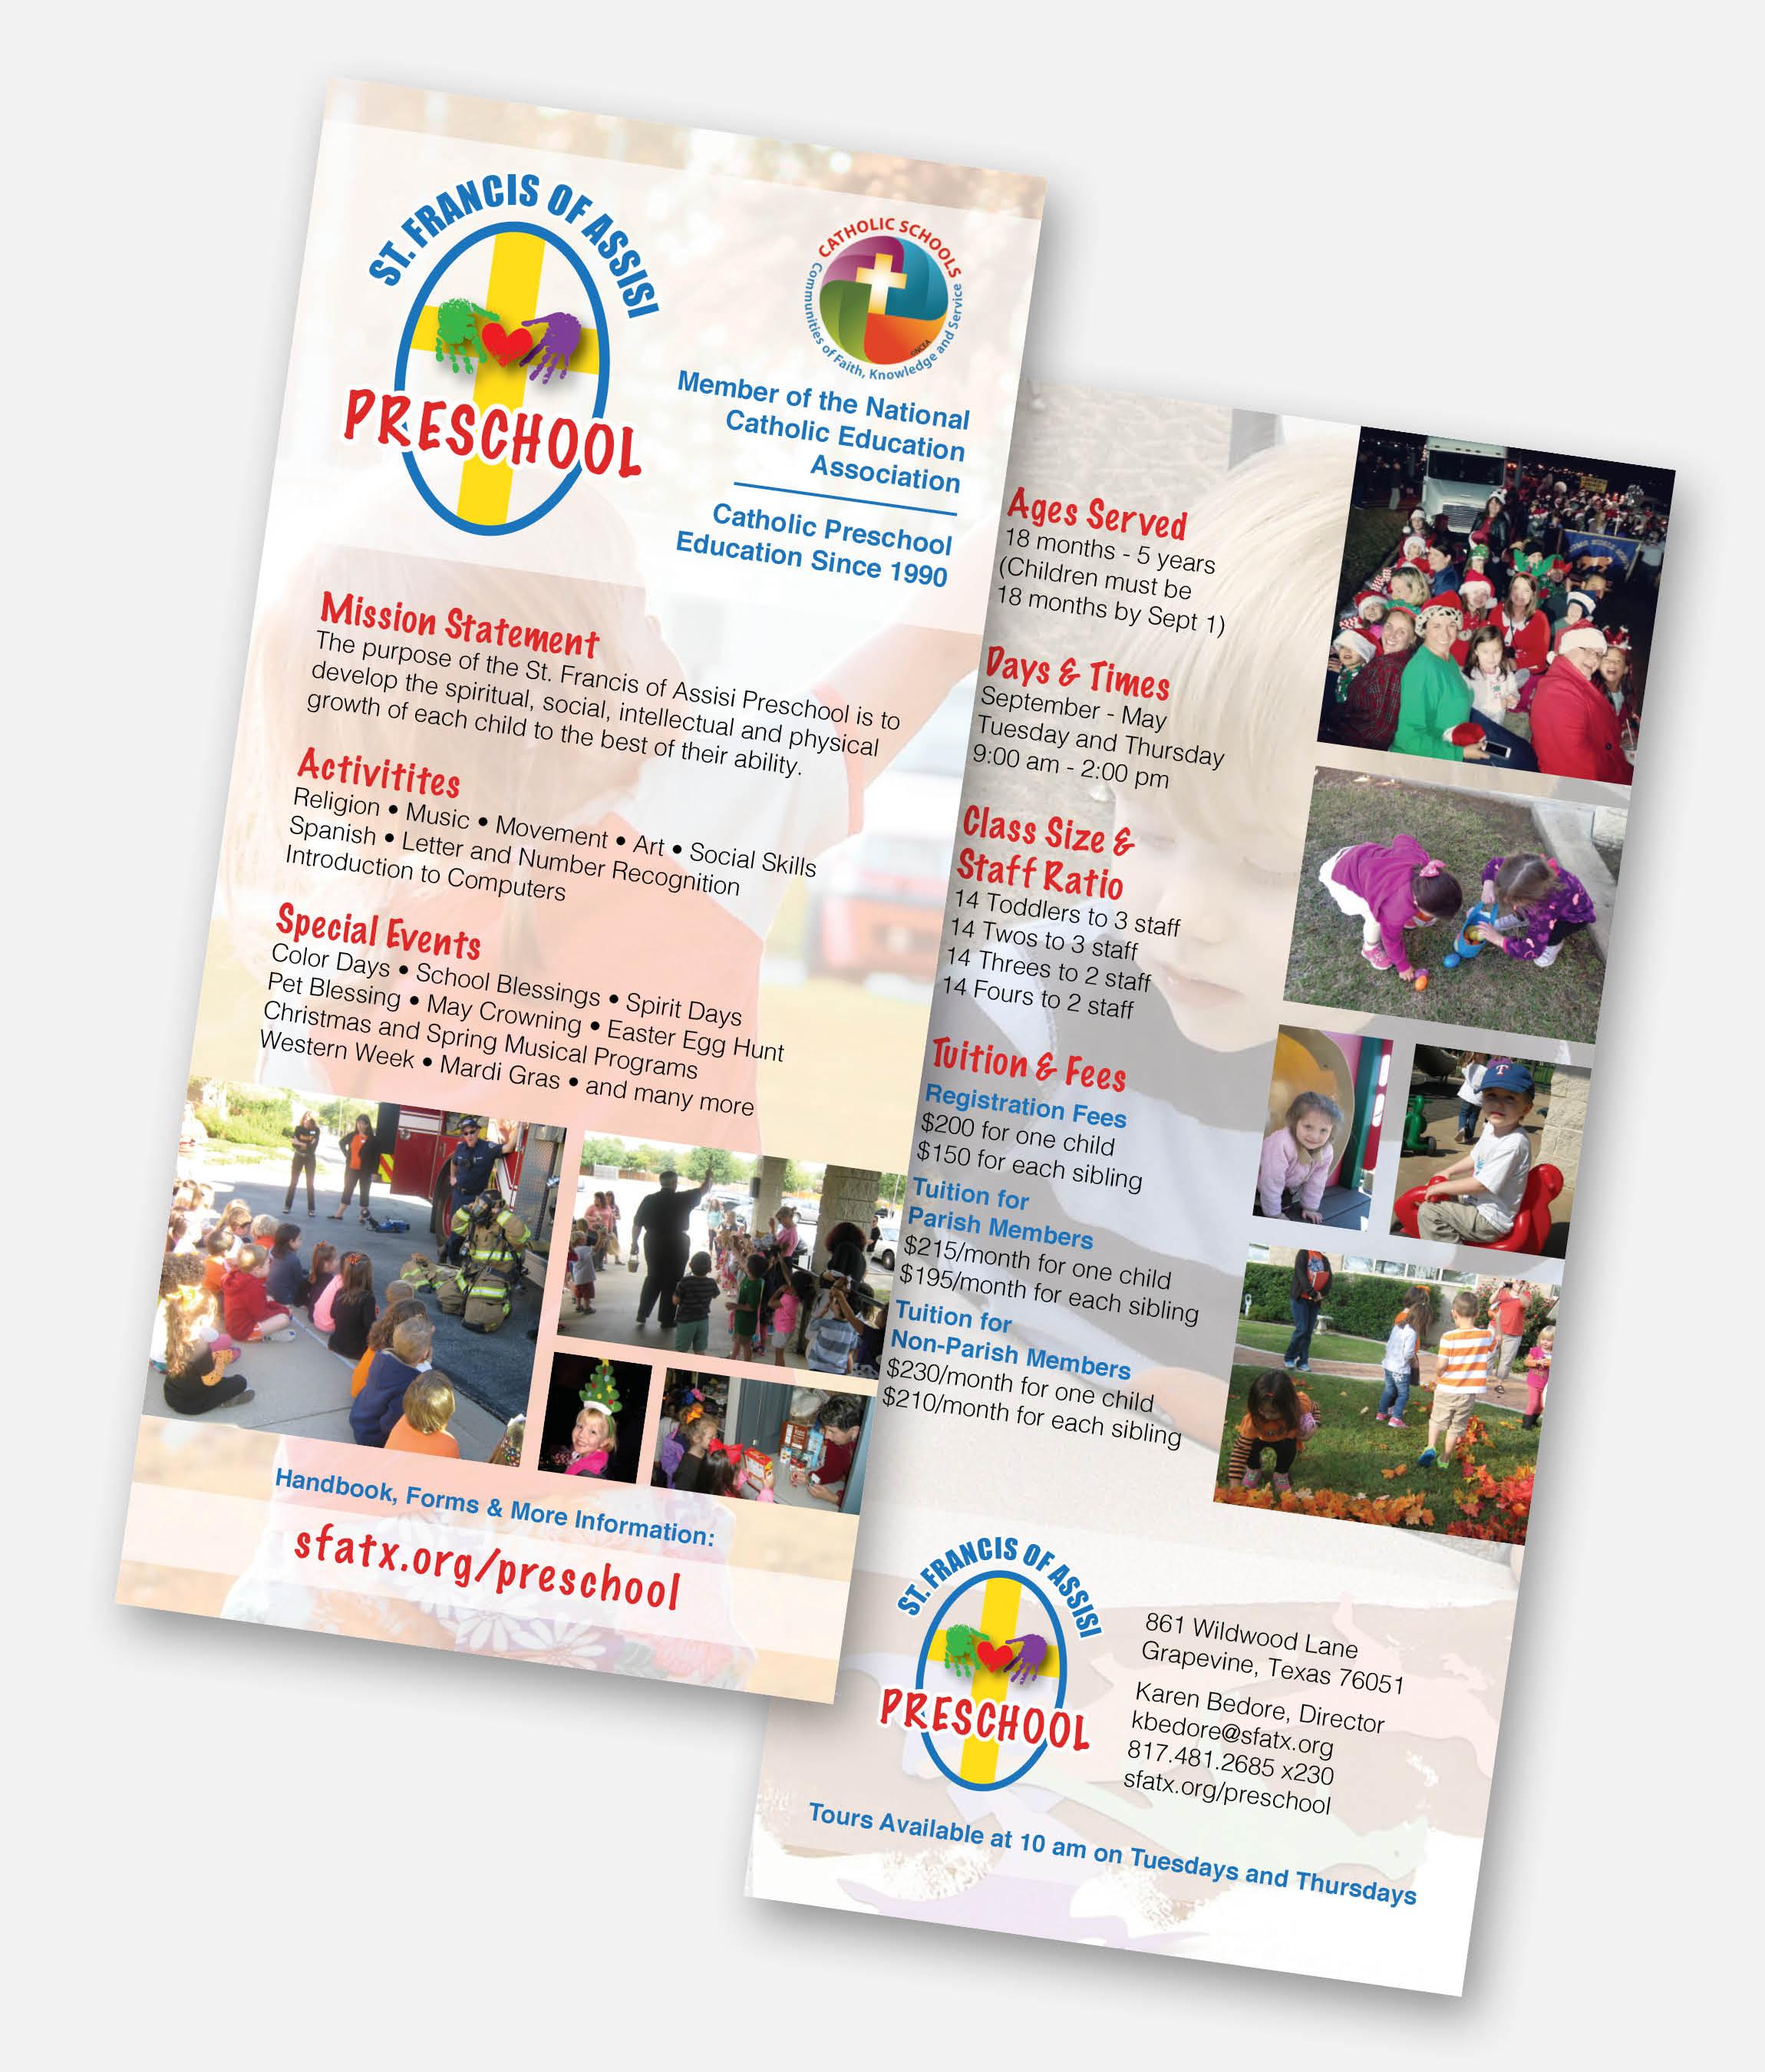 preschool-brochure.jpg